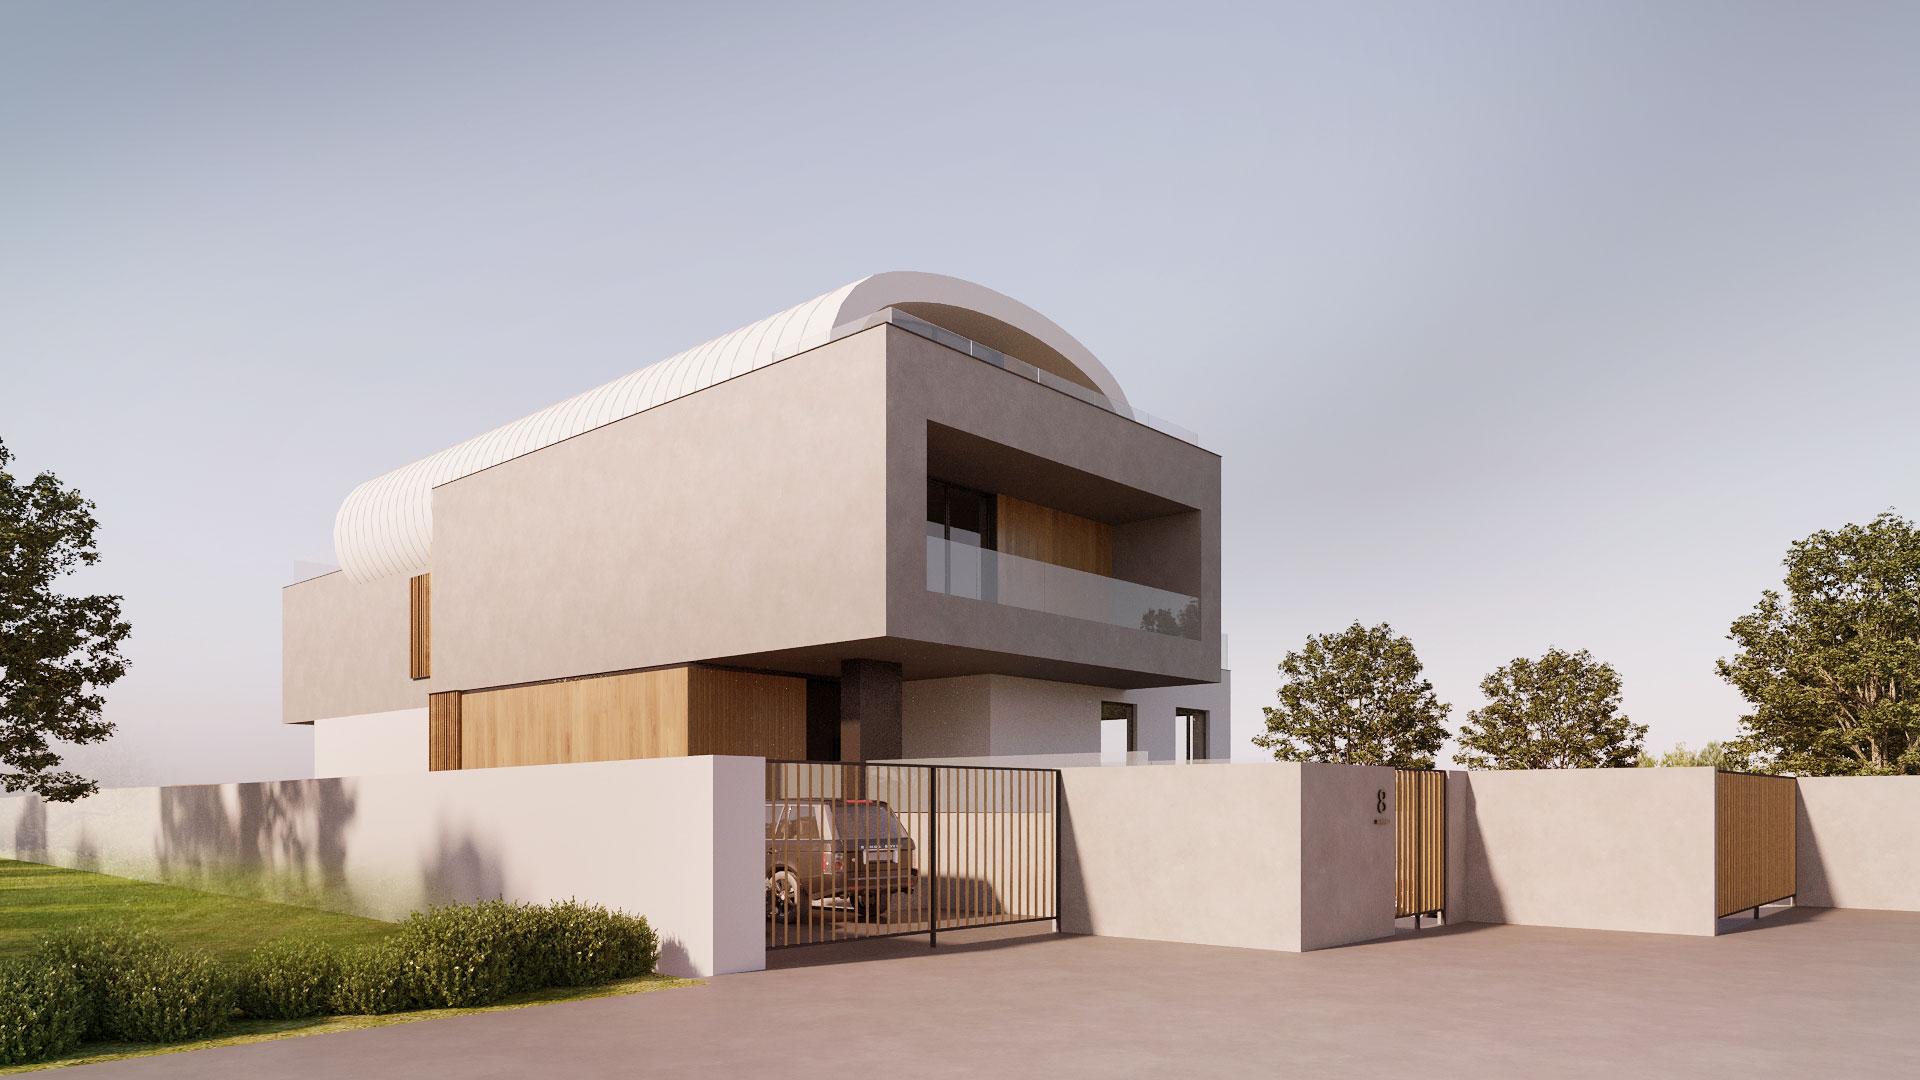 https://nbc-arhitect.ro/wp-content/uploads/2020/10/NBC-Arhitect-_-residences-_-Mogo-Villa-2-_-Romania-_-exterior-view_6.jpg